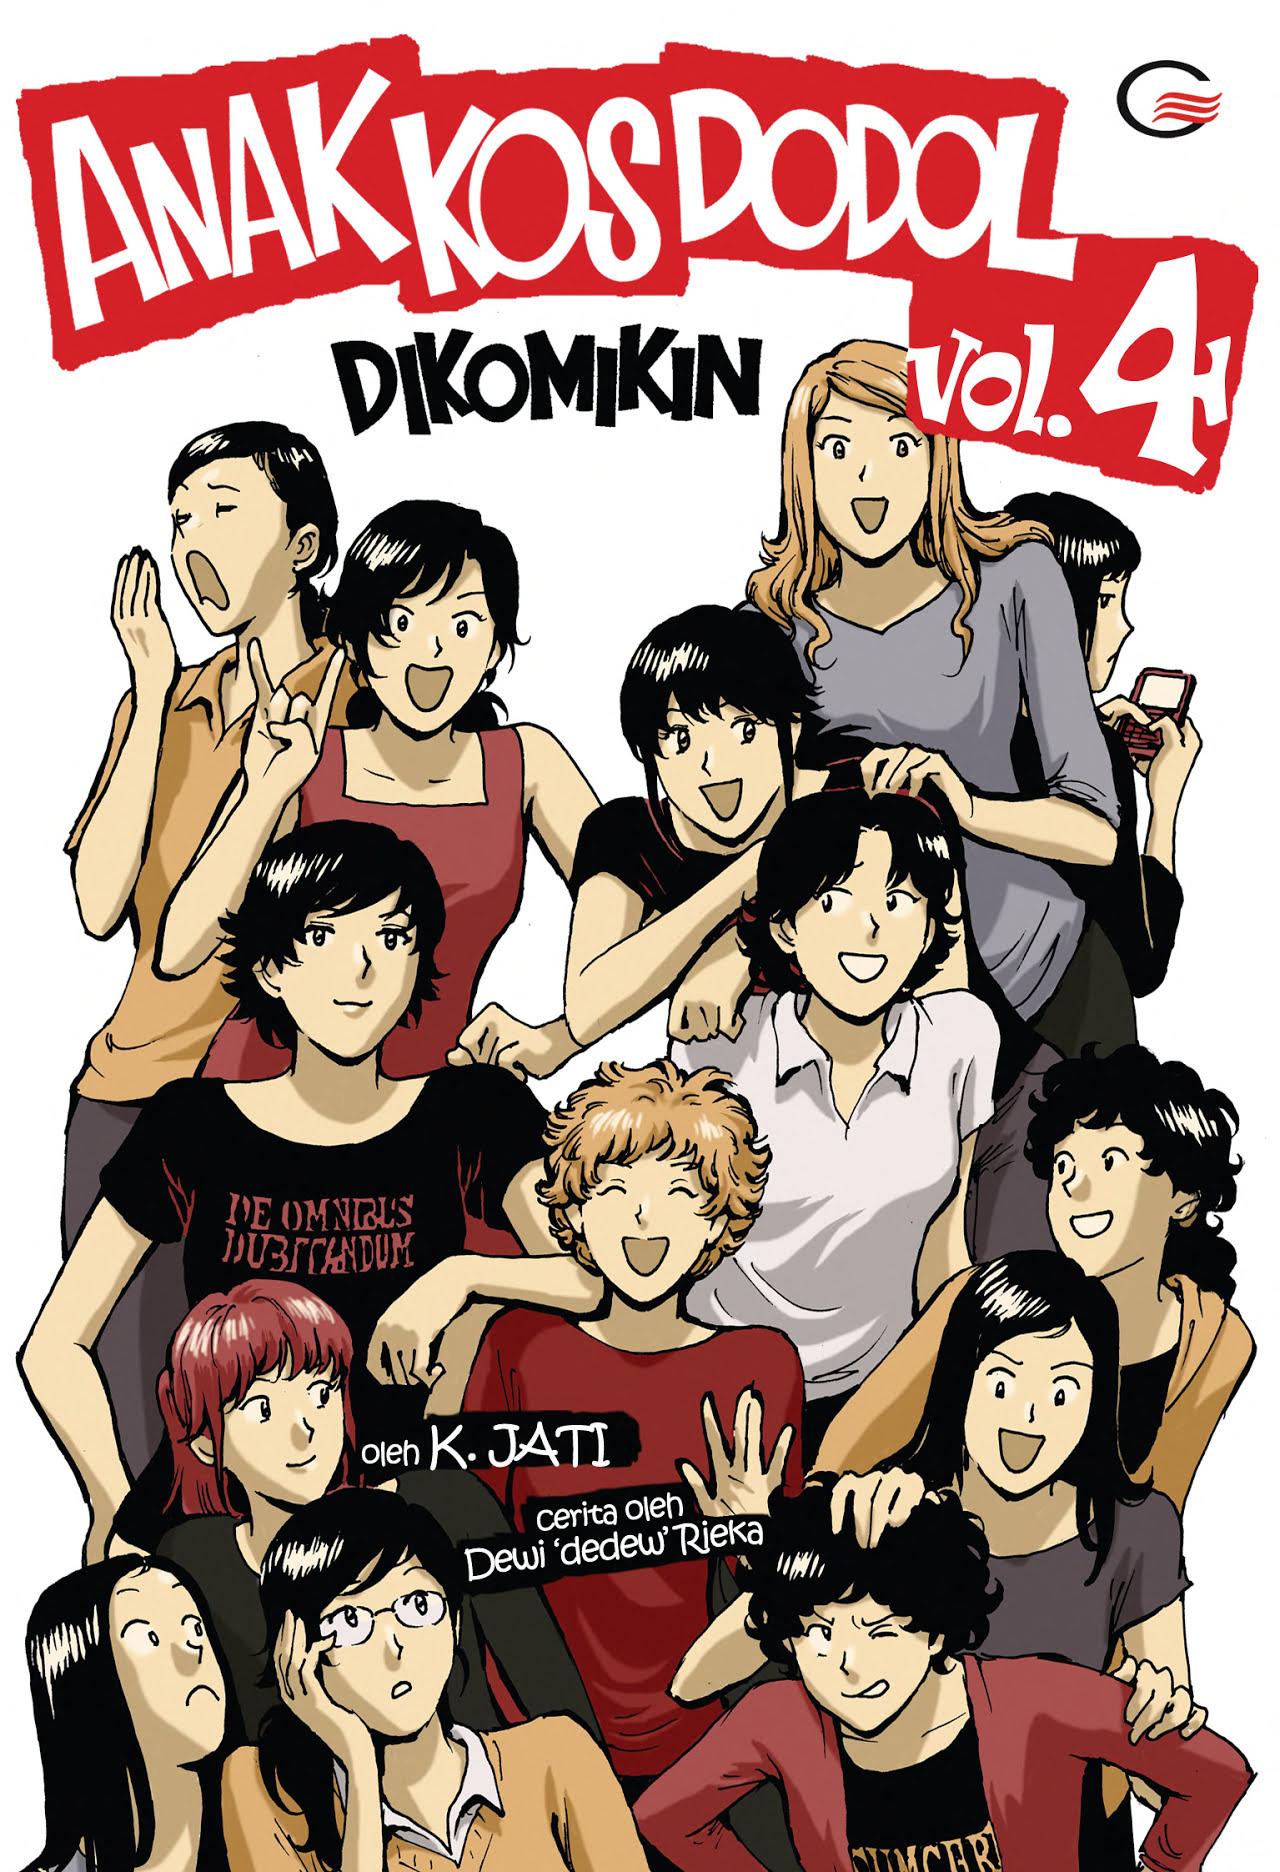 Anak Kos Dodol Dikomikin Vol.4